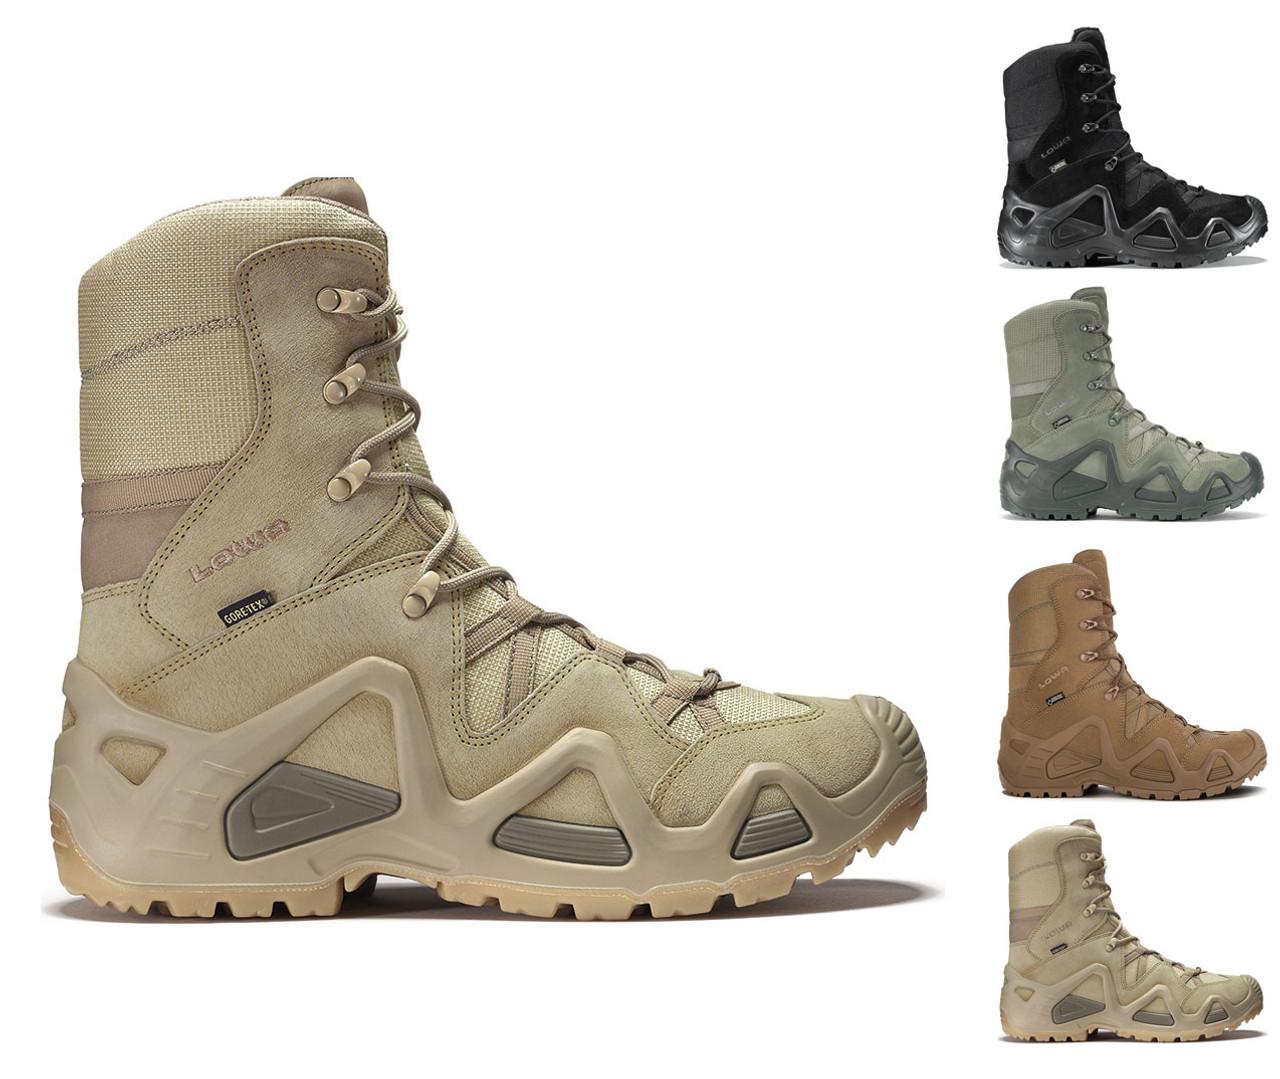 345ded886d8 Lowa Men's Zephyr GTX Hi TF Boots